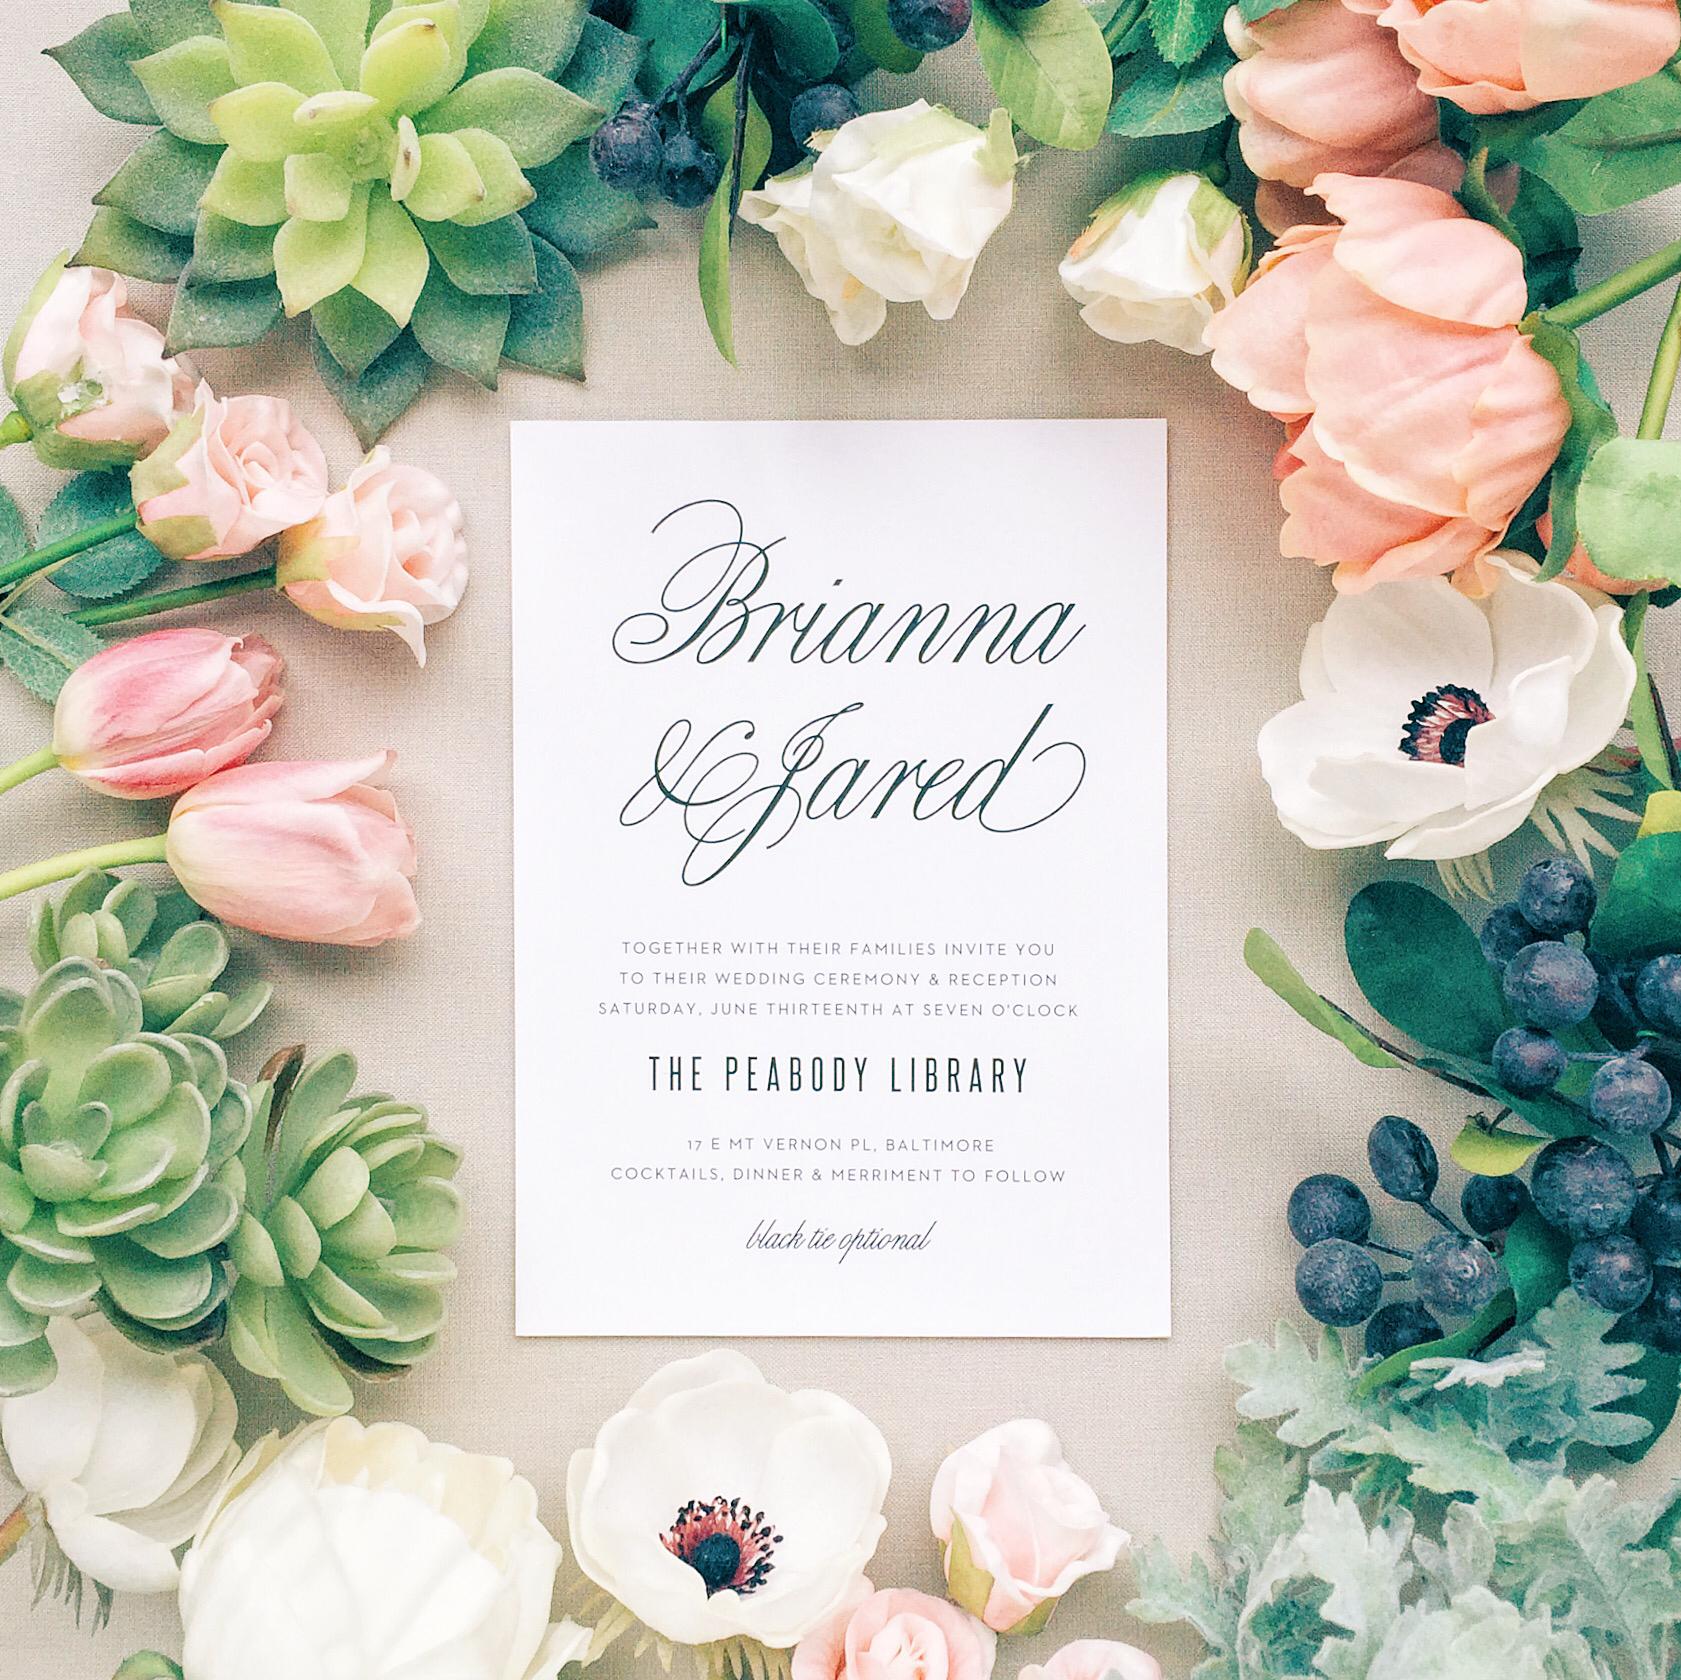 Traditional Script Wedding Invitations | Invitation suite, Weddings ...